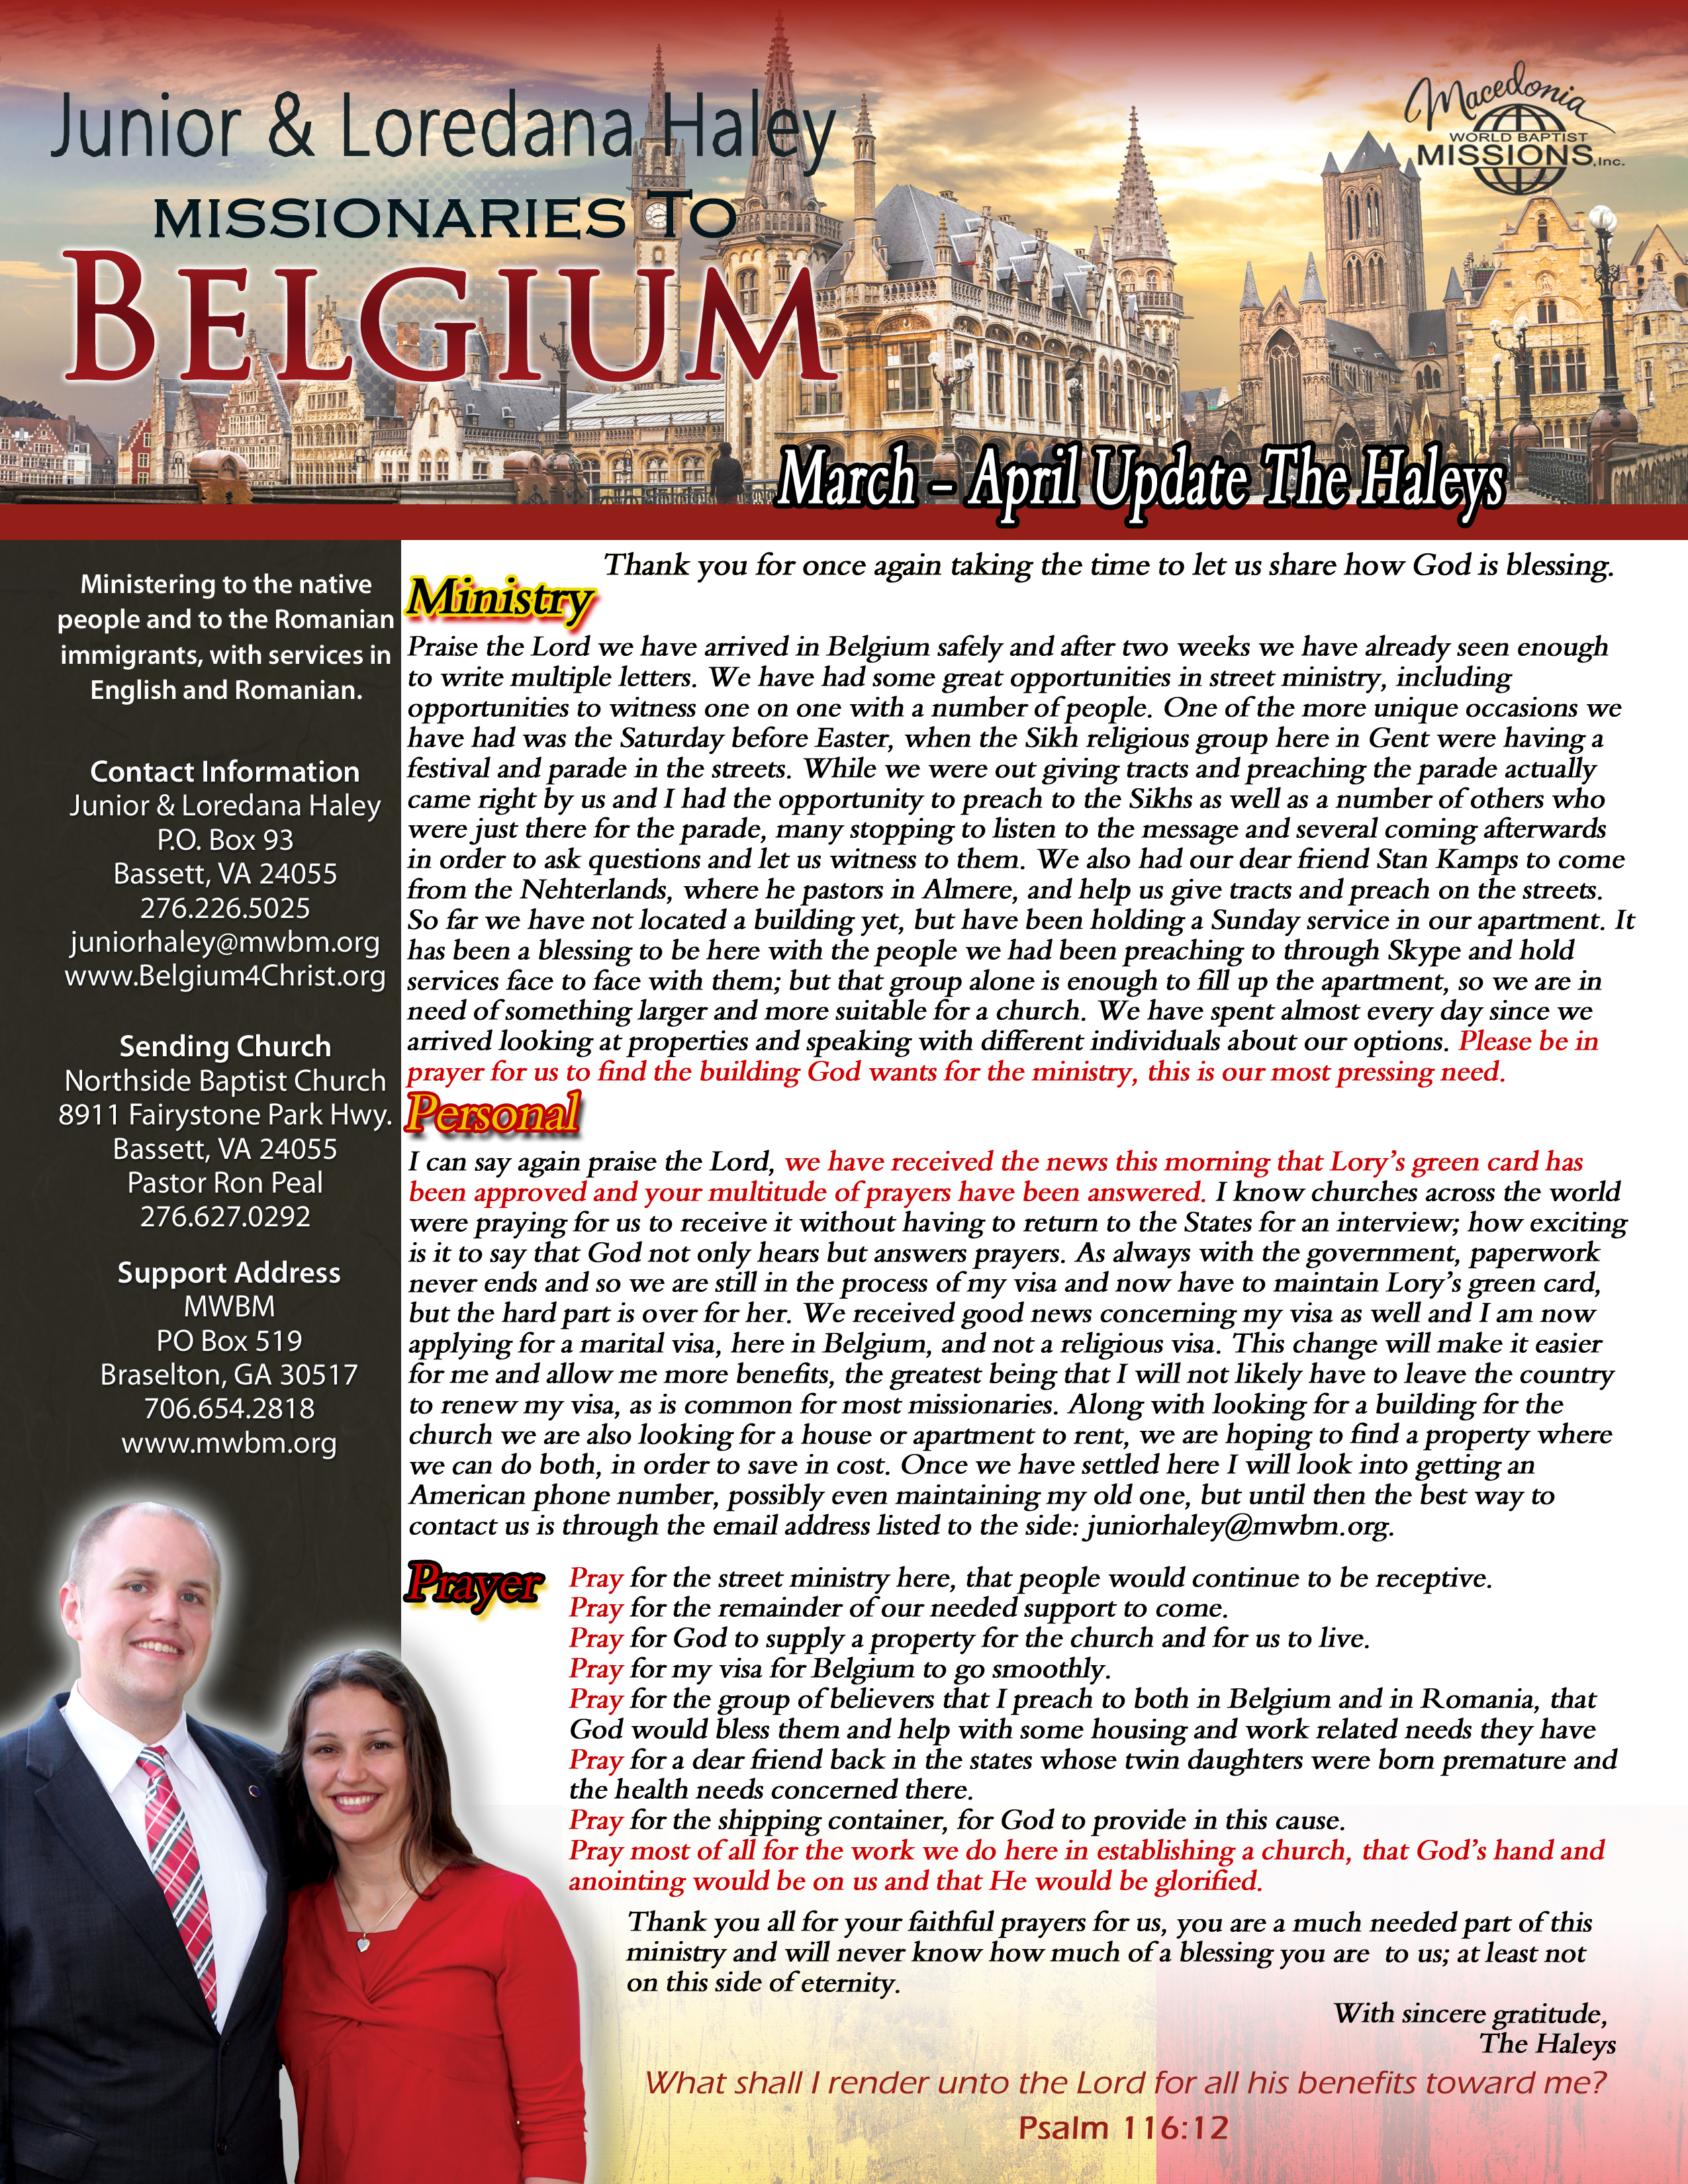 Haley prayer letter march april 2017 belgium for christ 2017 mar april prayer letter pg 2 expocarfo Image collections